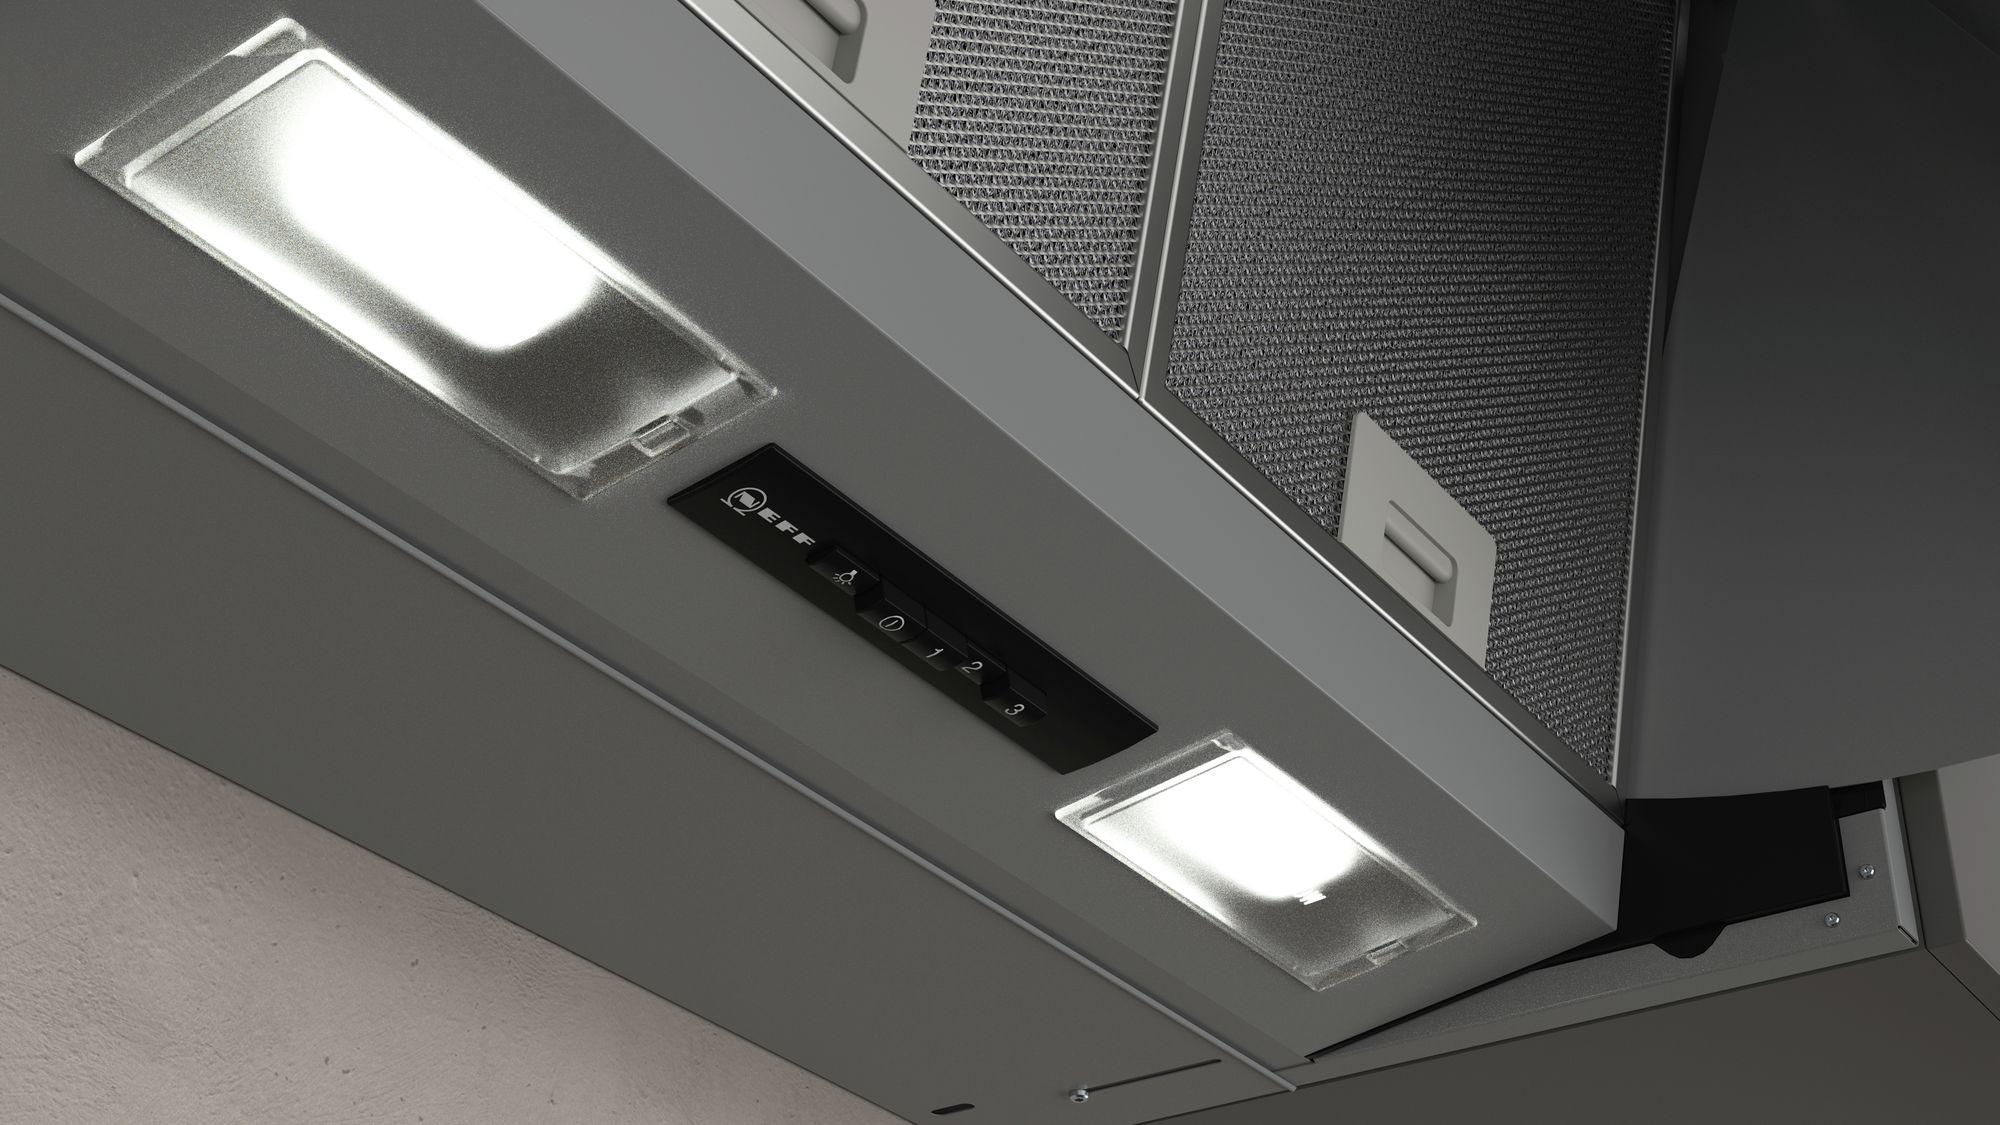 Fettfilter dunstabzugshaube spülmaschine: dunstabzugshaube filter